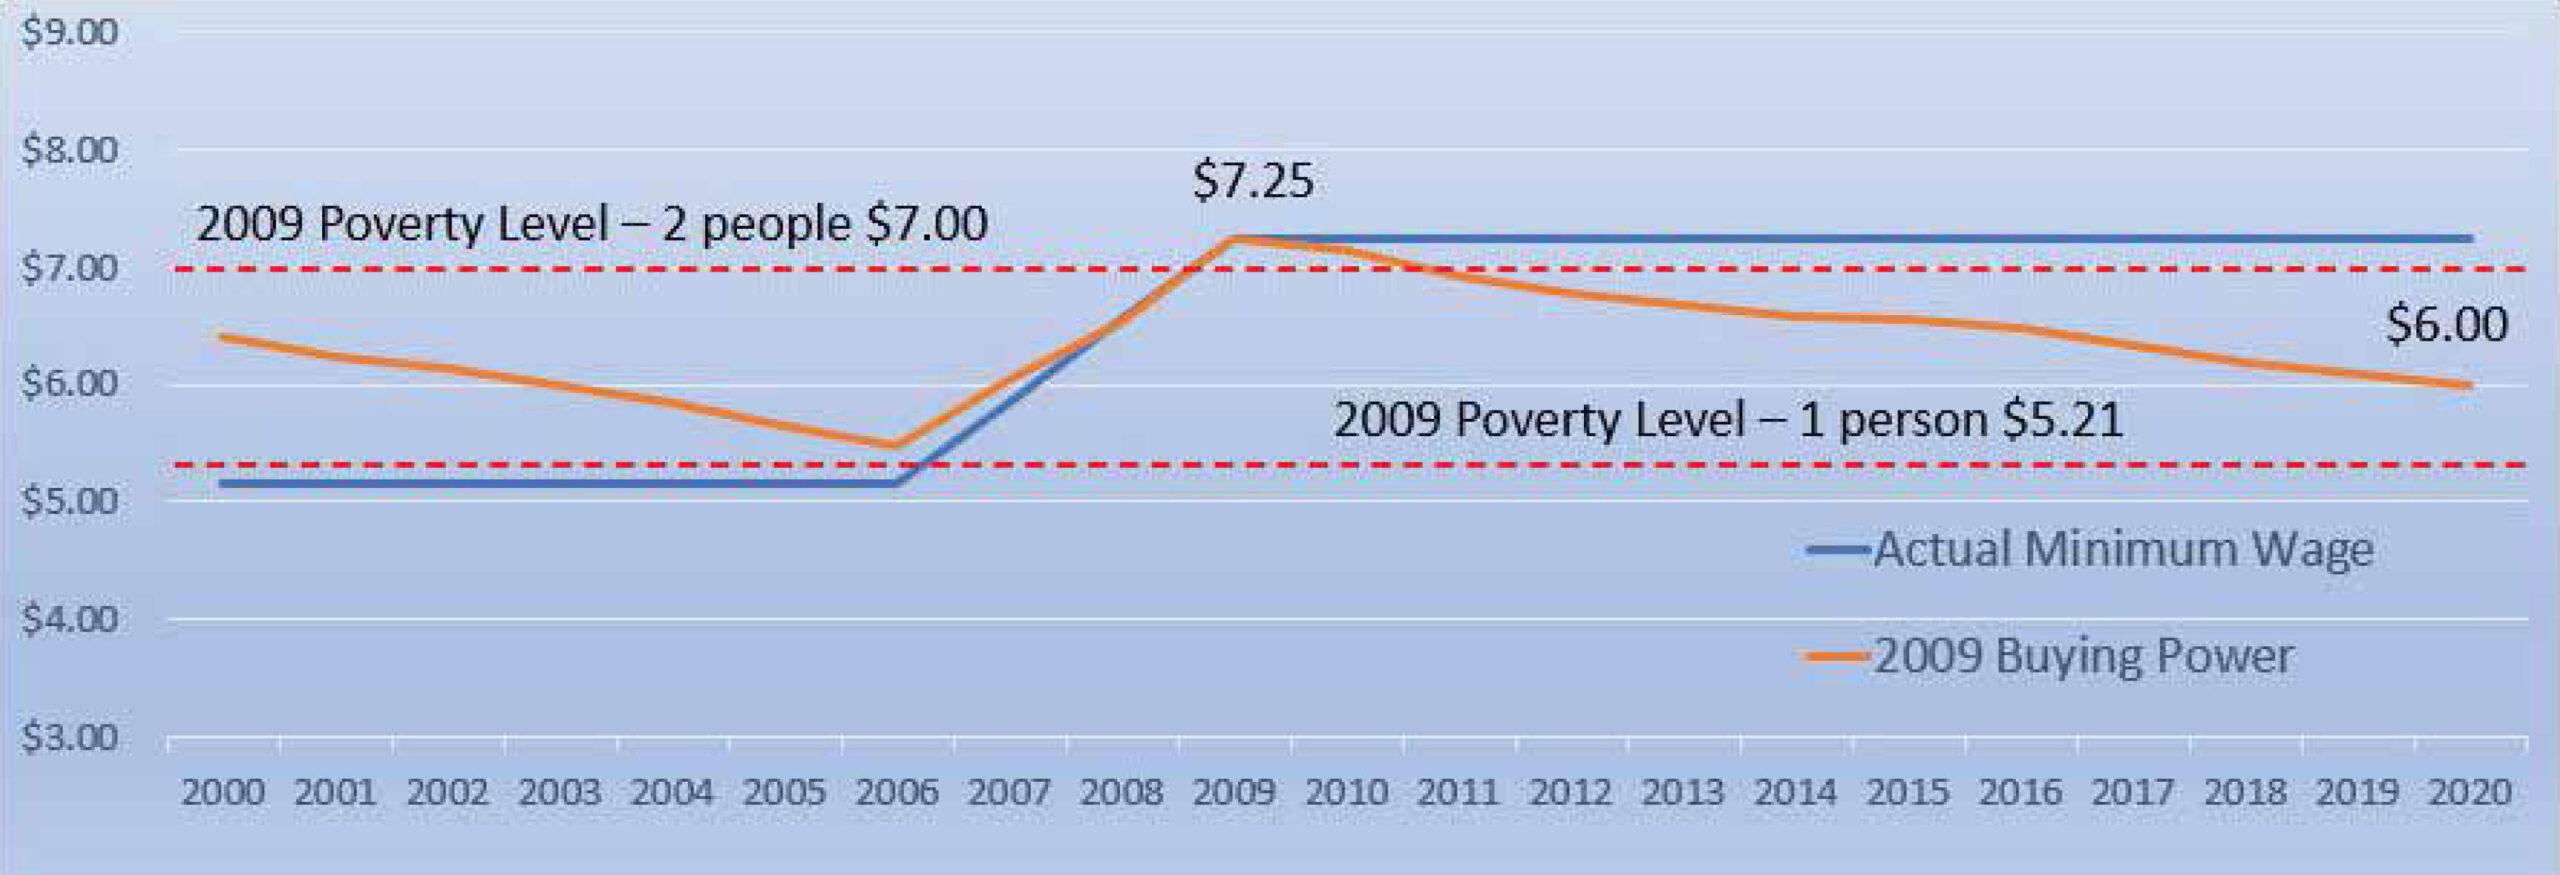 Buying power of the minimum wage